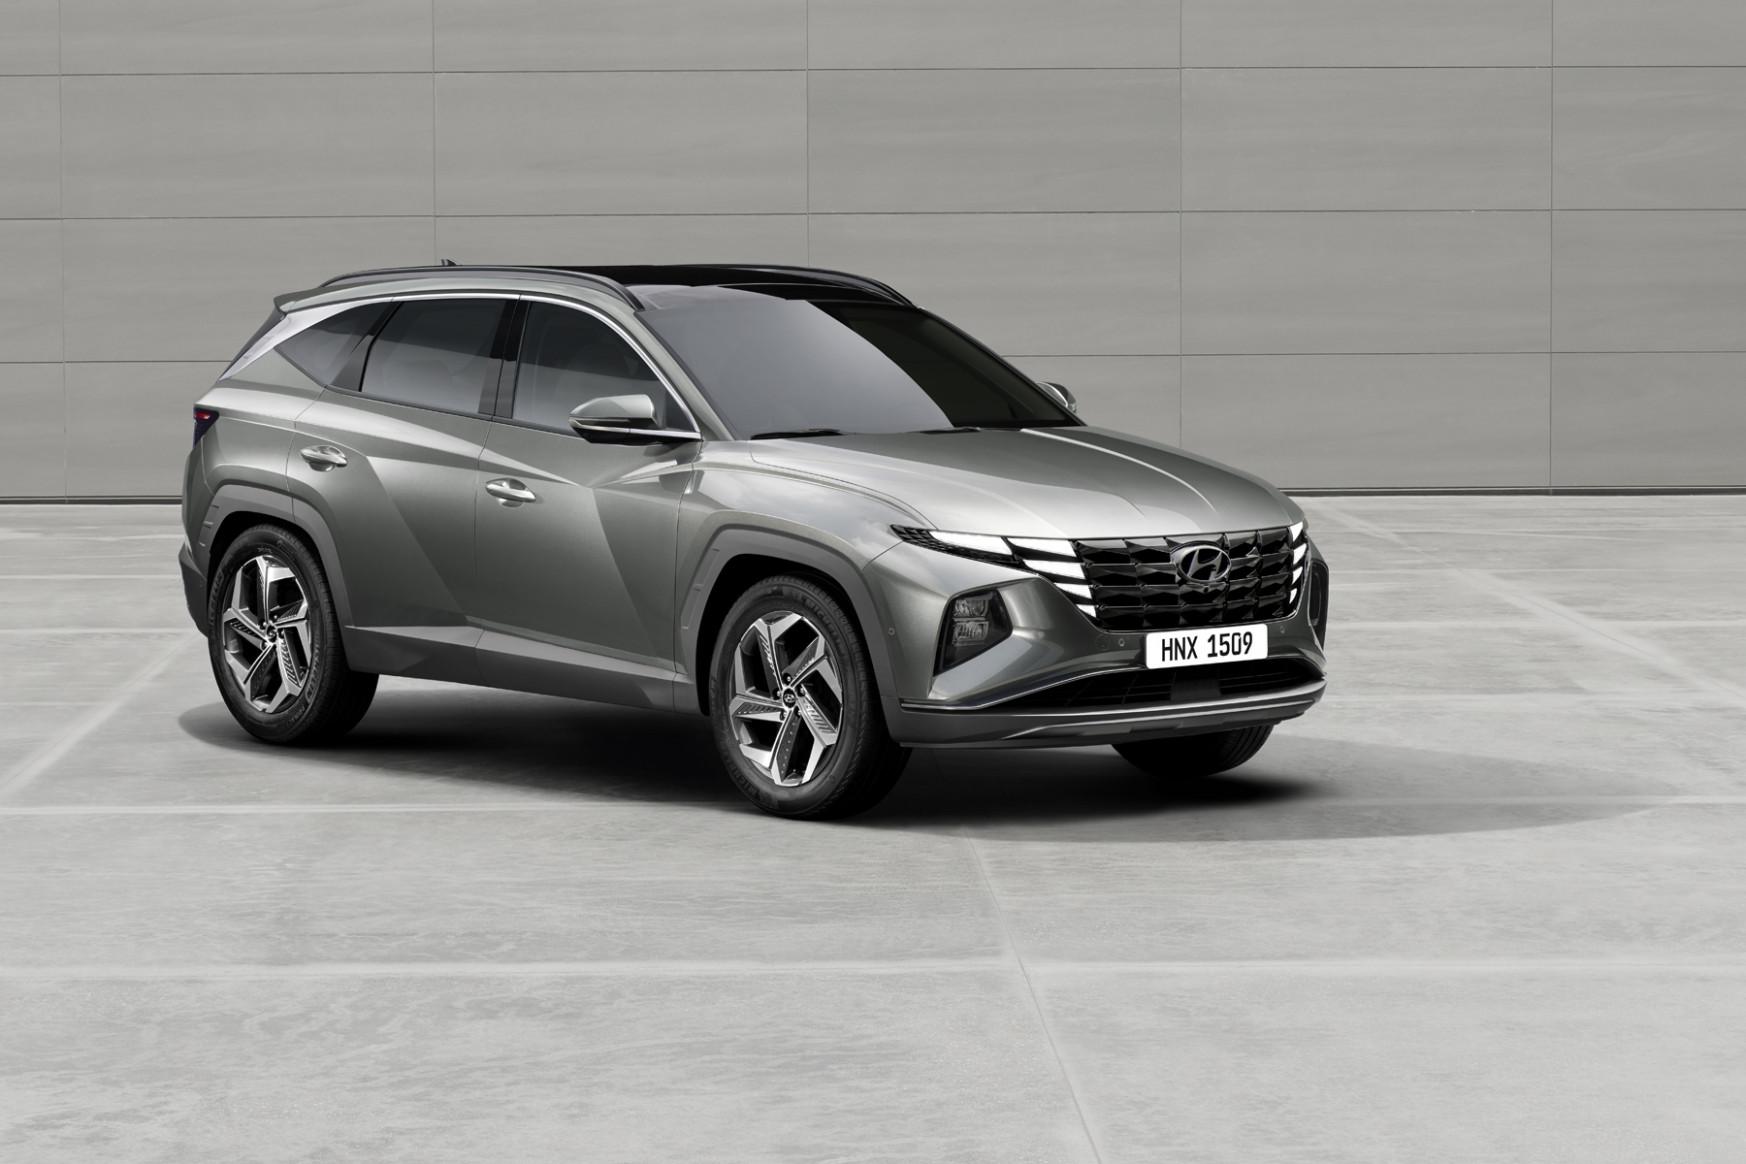 New Concept Hyundai Ute 2022